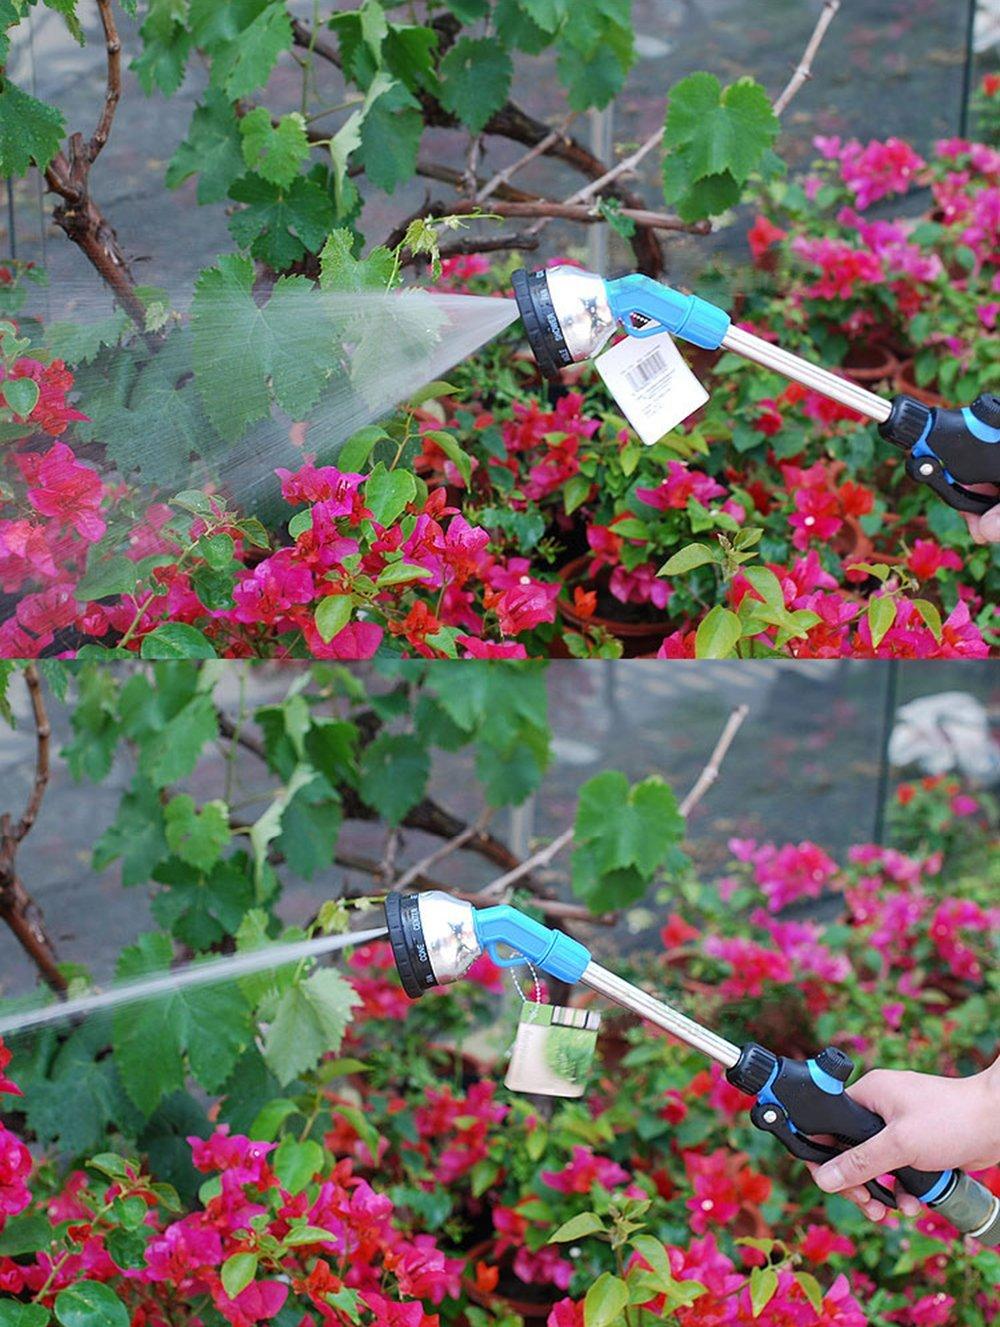 MyLifeUNIT Garden Dramm Watering Wand Hose, Aluminium Water Wand 9 Pattern, 16 Inch by MyLifeUNIT (Image #3)